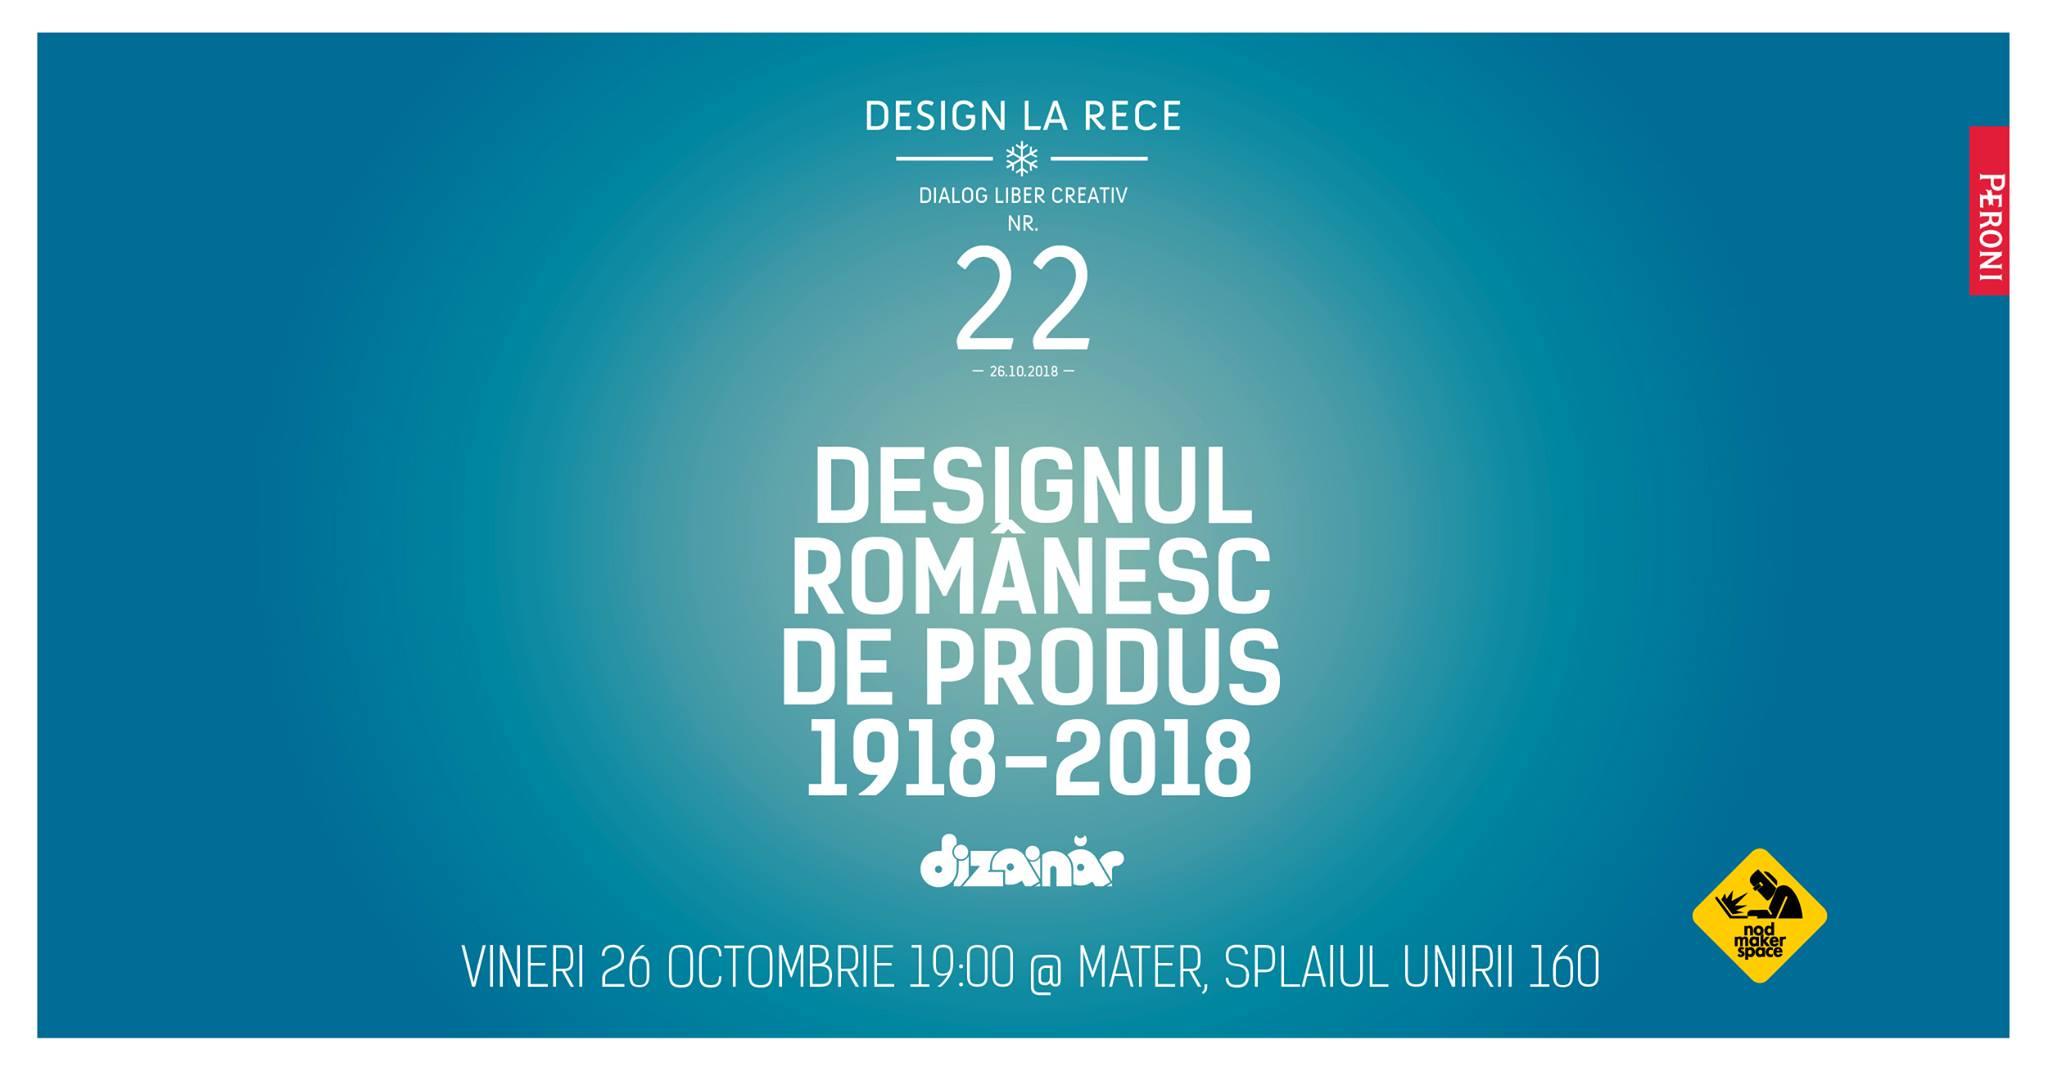 Design la Rece #22 | Design de produs 1918-2018